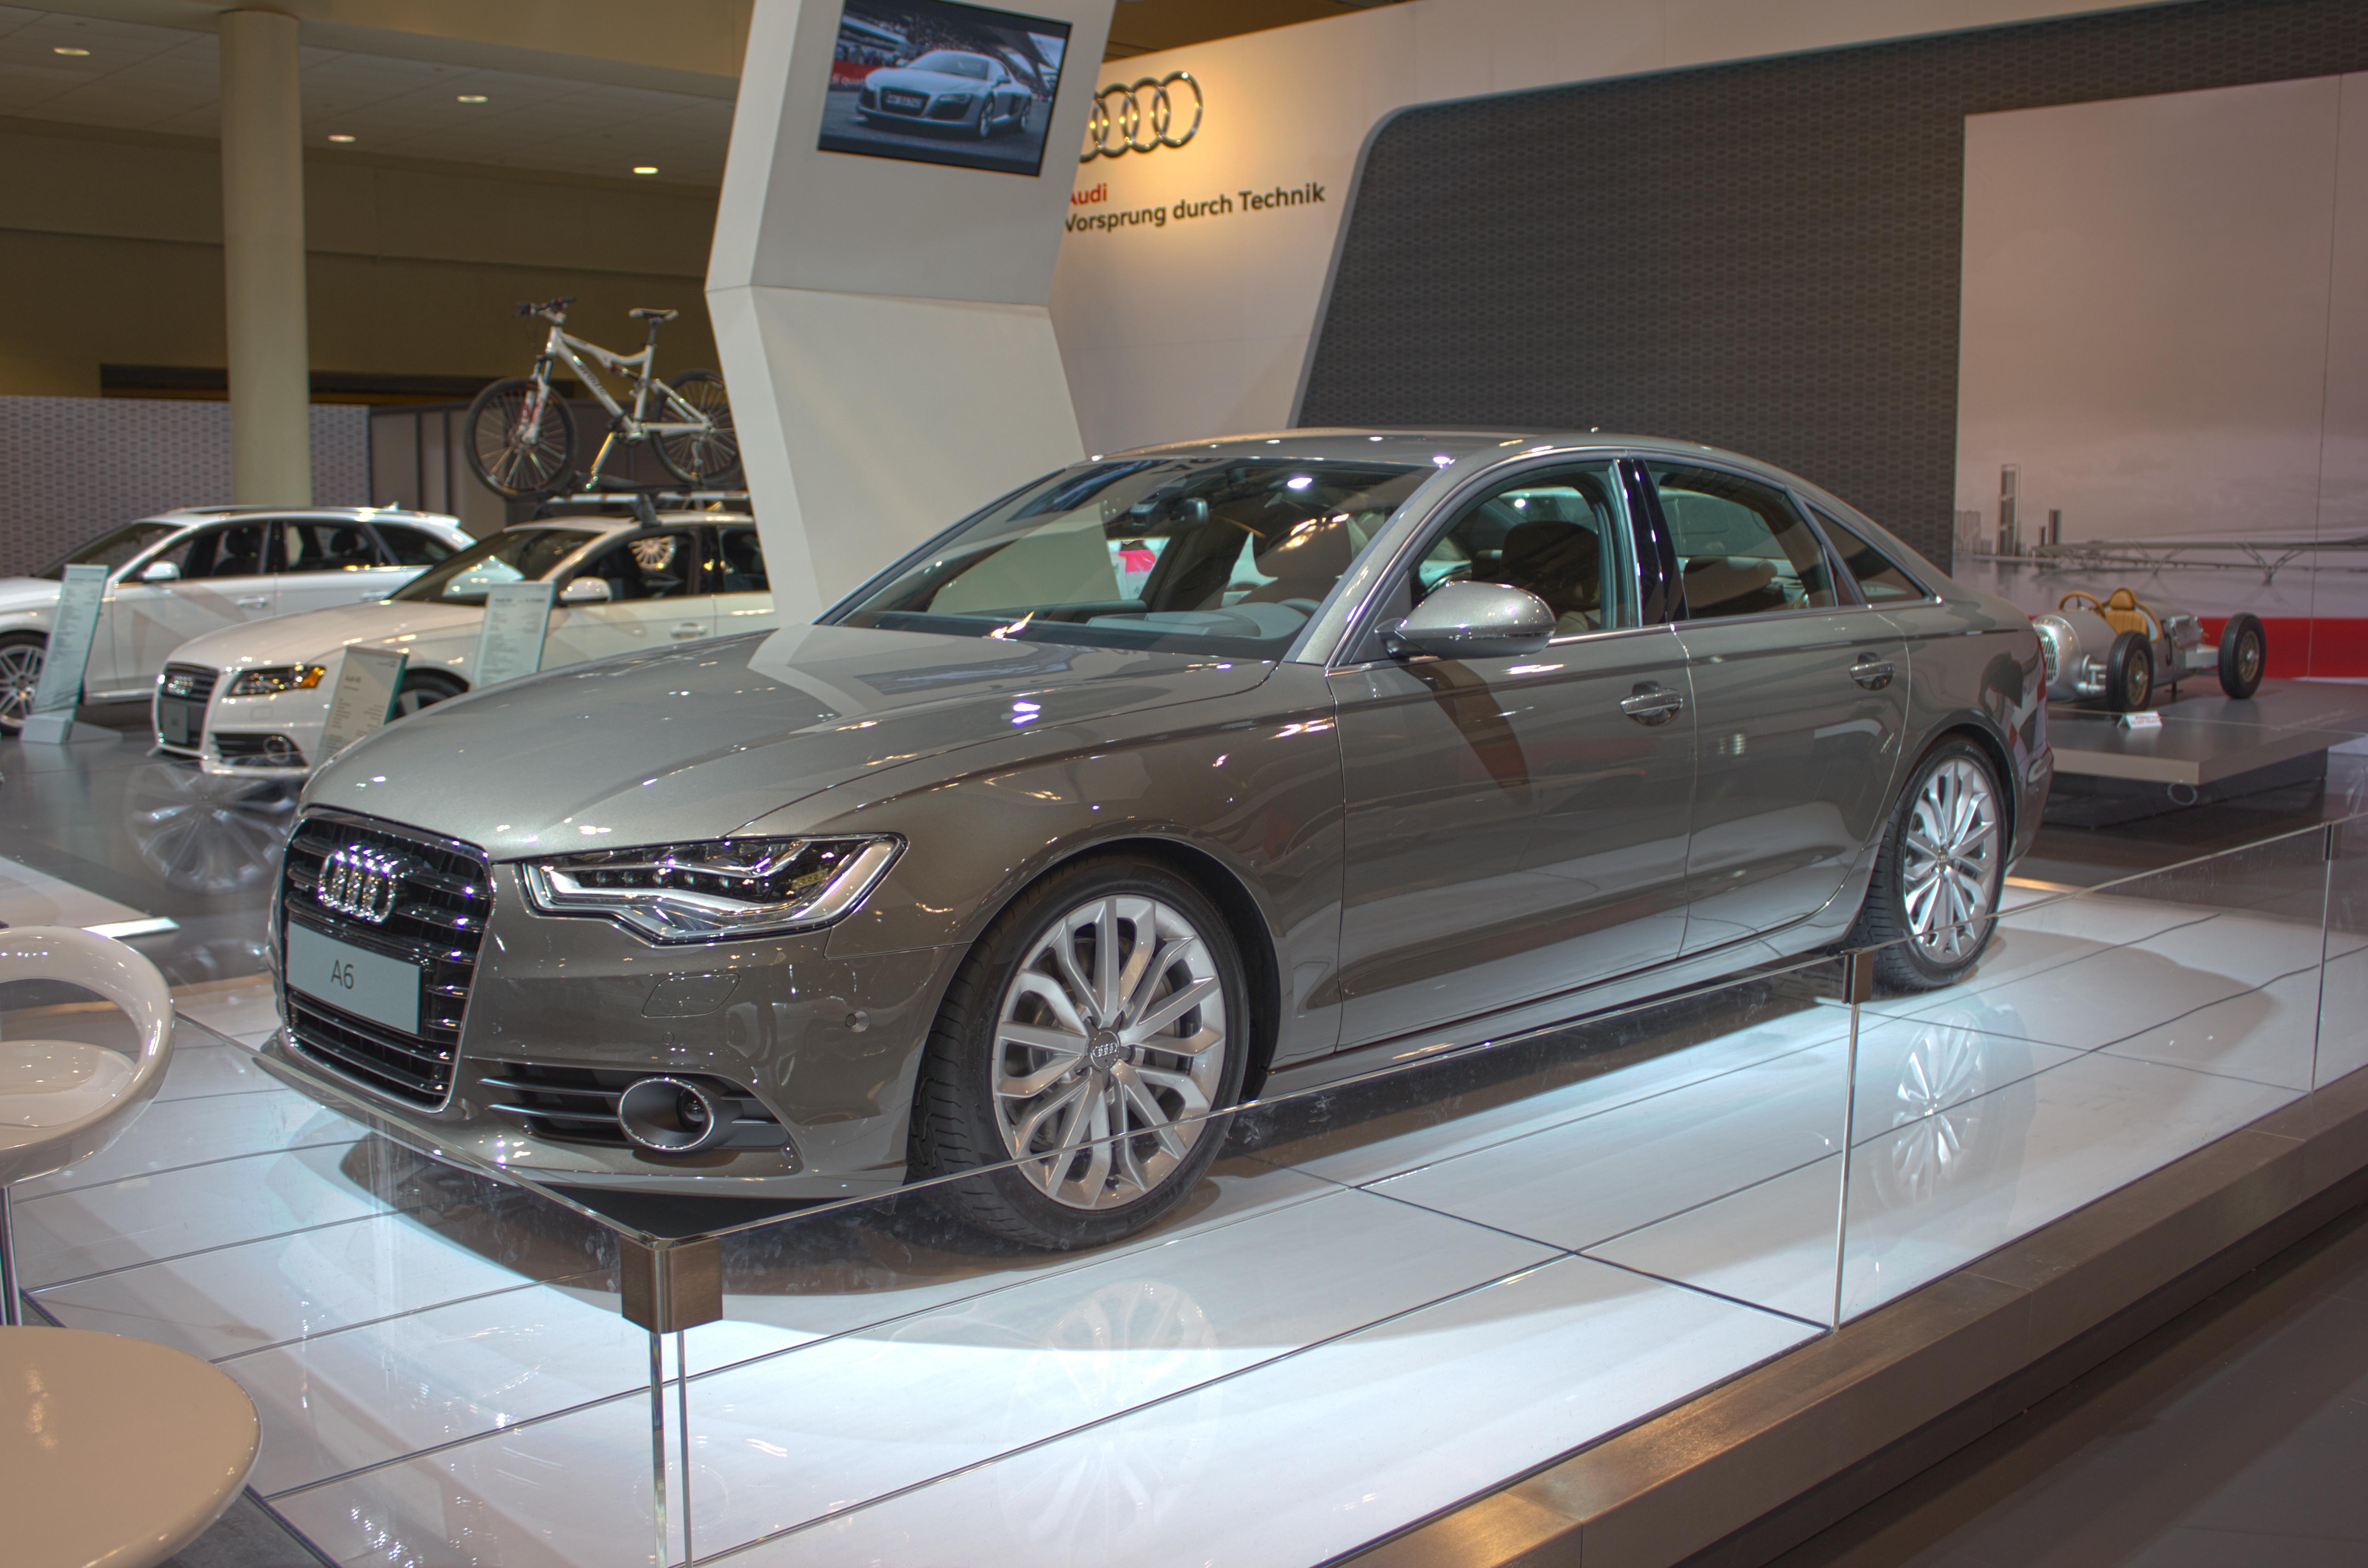 FileAudi A HDR At Toronto Auto Show Jpg Wikimedia Commons - Audi toronto